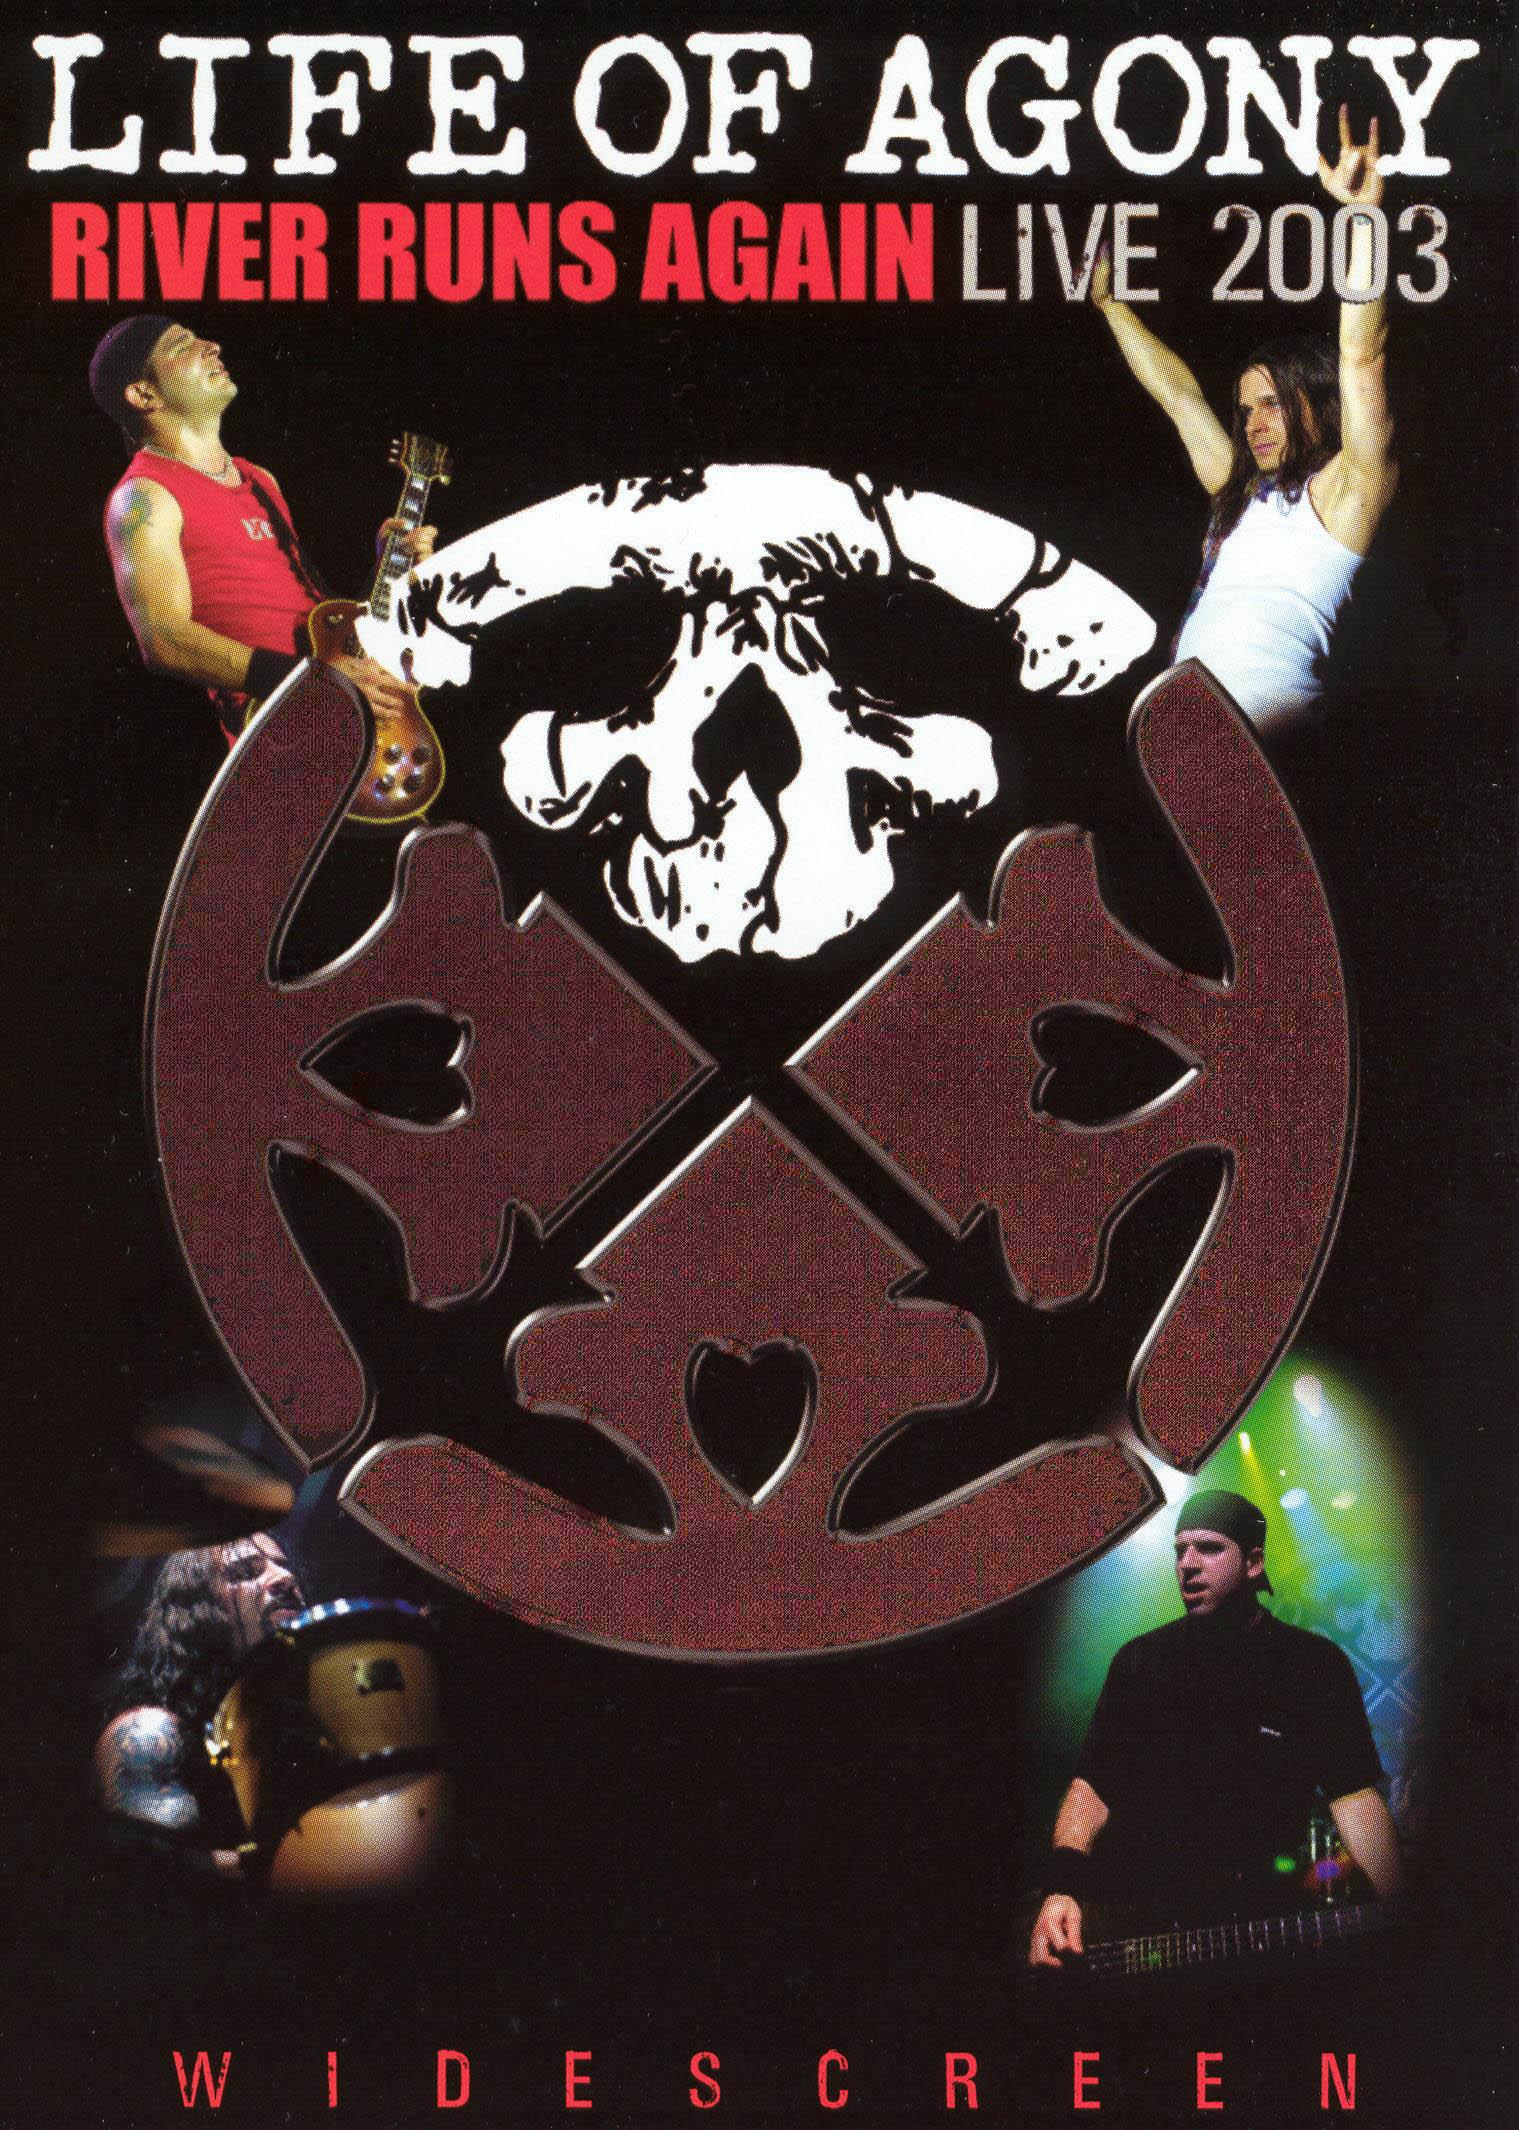 Life of Agony: River Runs Again - Live 2003